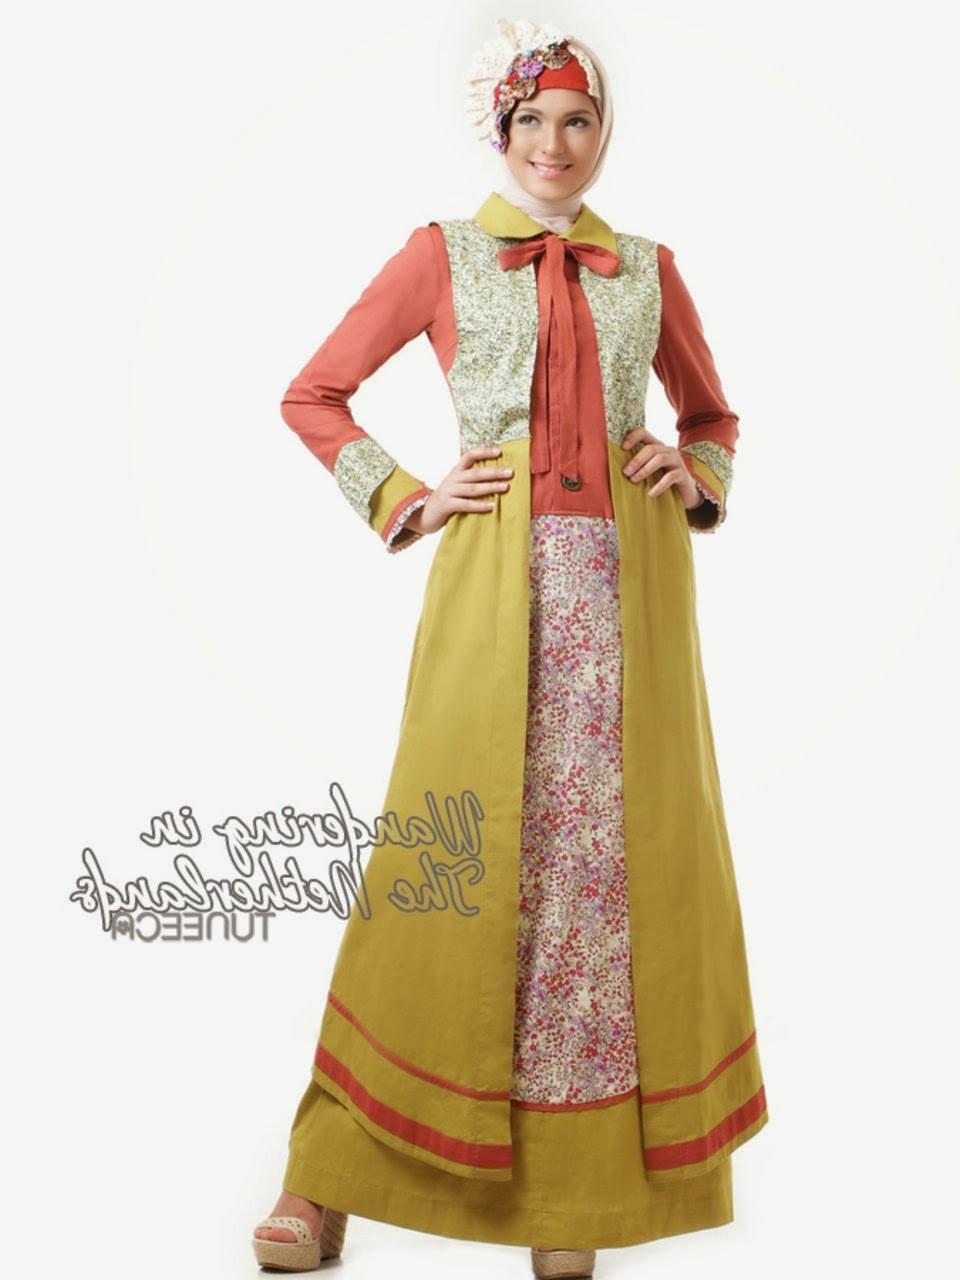 Inspirasi Foto Baju Lebaran 3ldq 12 Contoh Model Gamis Muslim Lebaran Terbaru Kumpulan